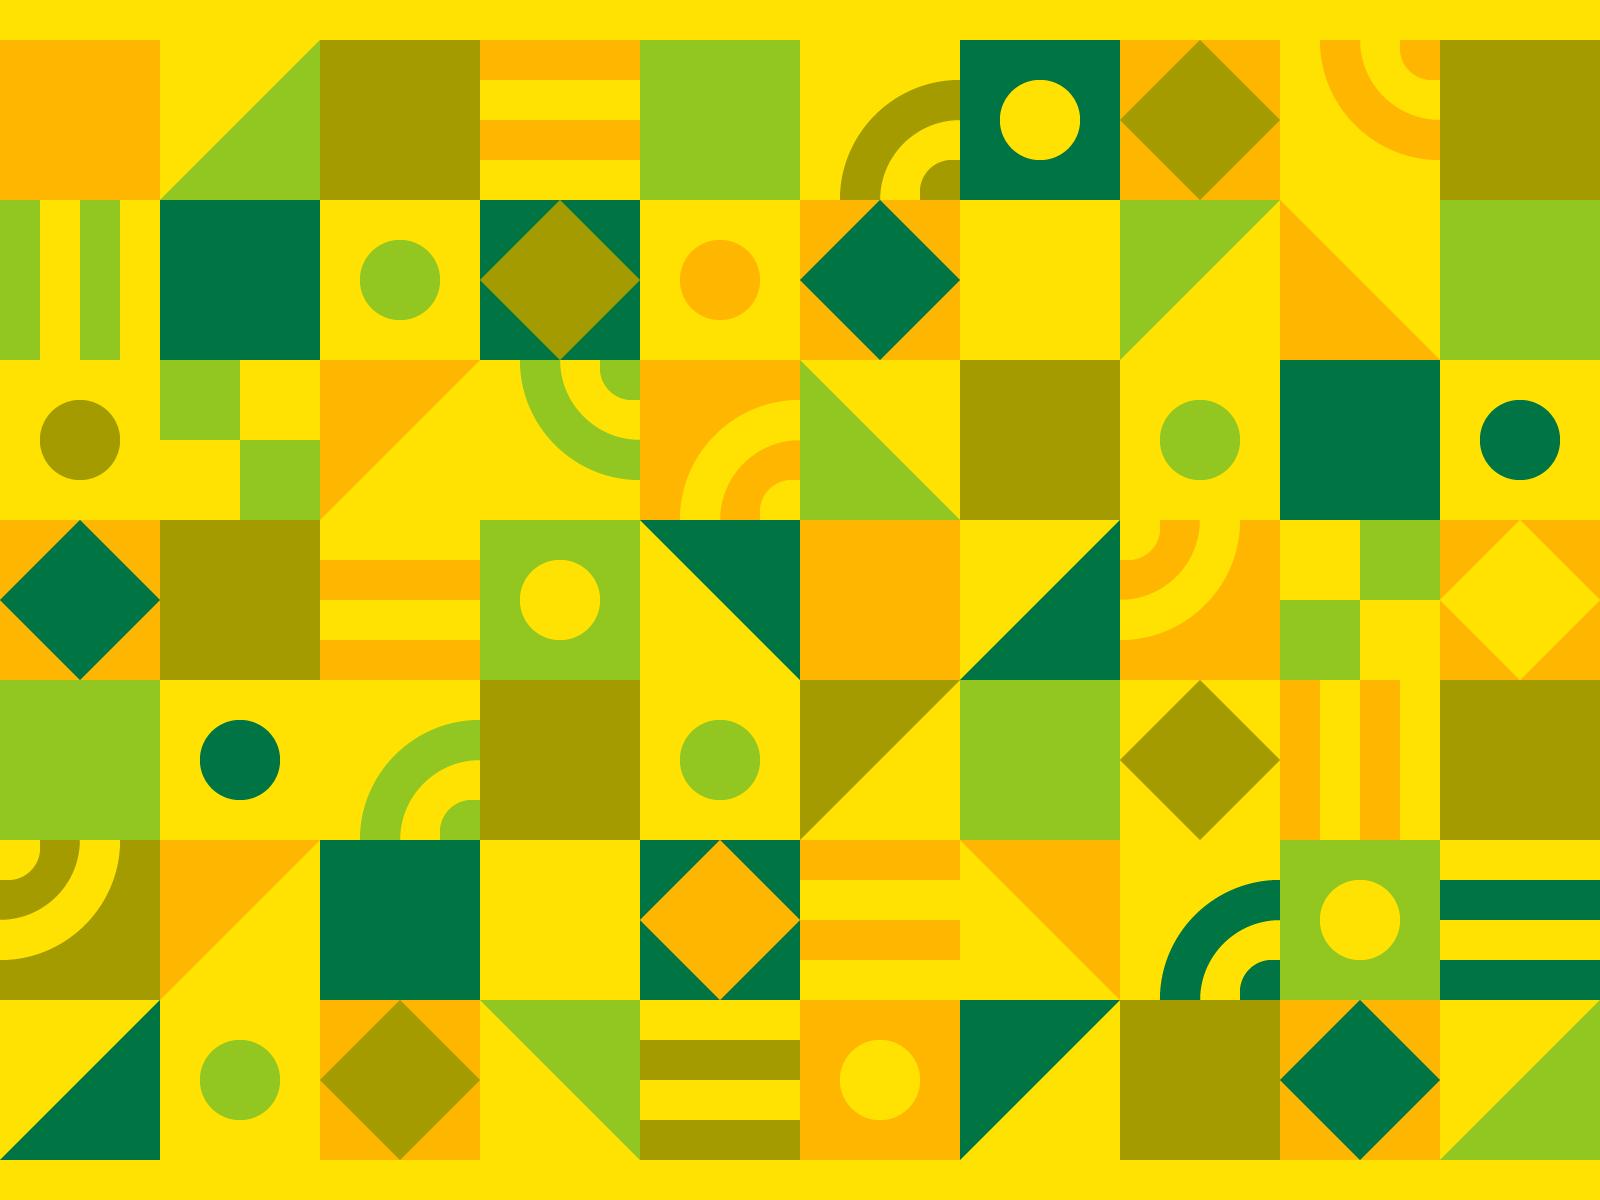 commotion-4-dribbble-alex-pasquarella_4x.png